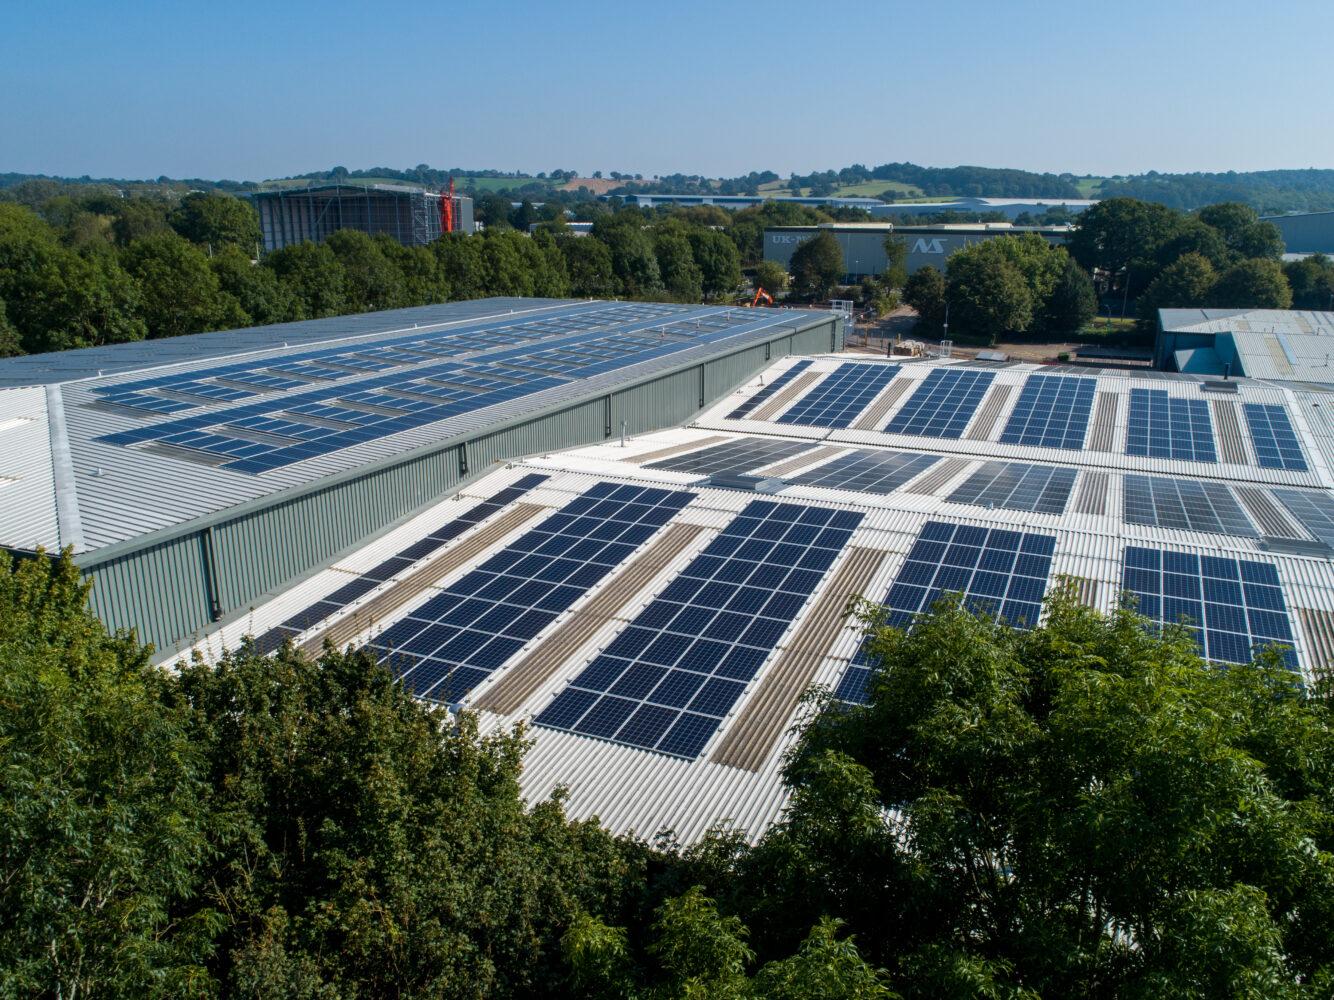 Solar panels on Thorlux roof